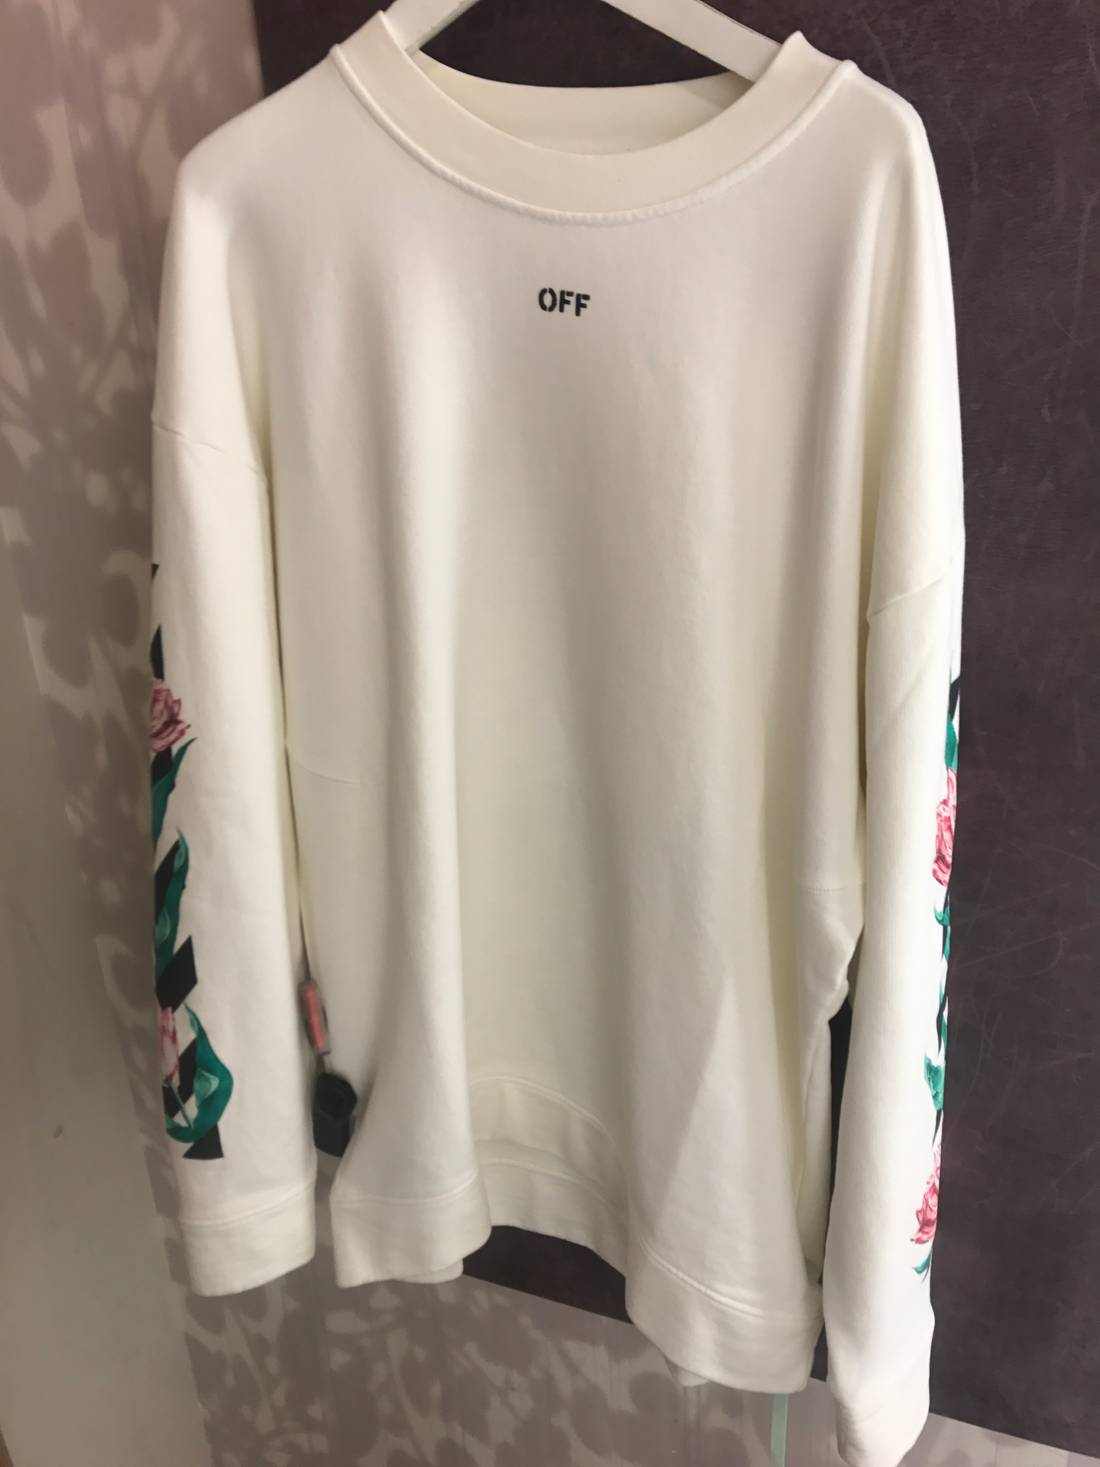 Off white off white flower crewneck oversized size xxl sweaters off white off white flower crewneck oversized size us xxl eu 58 mightylinksfo